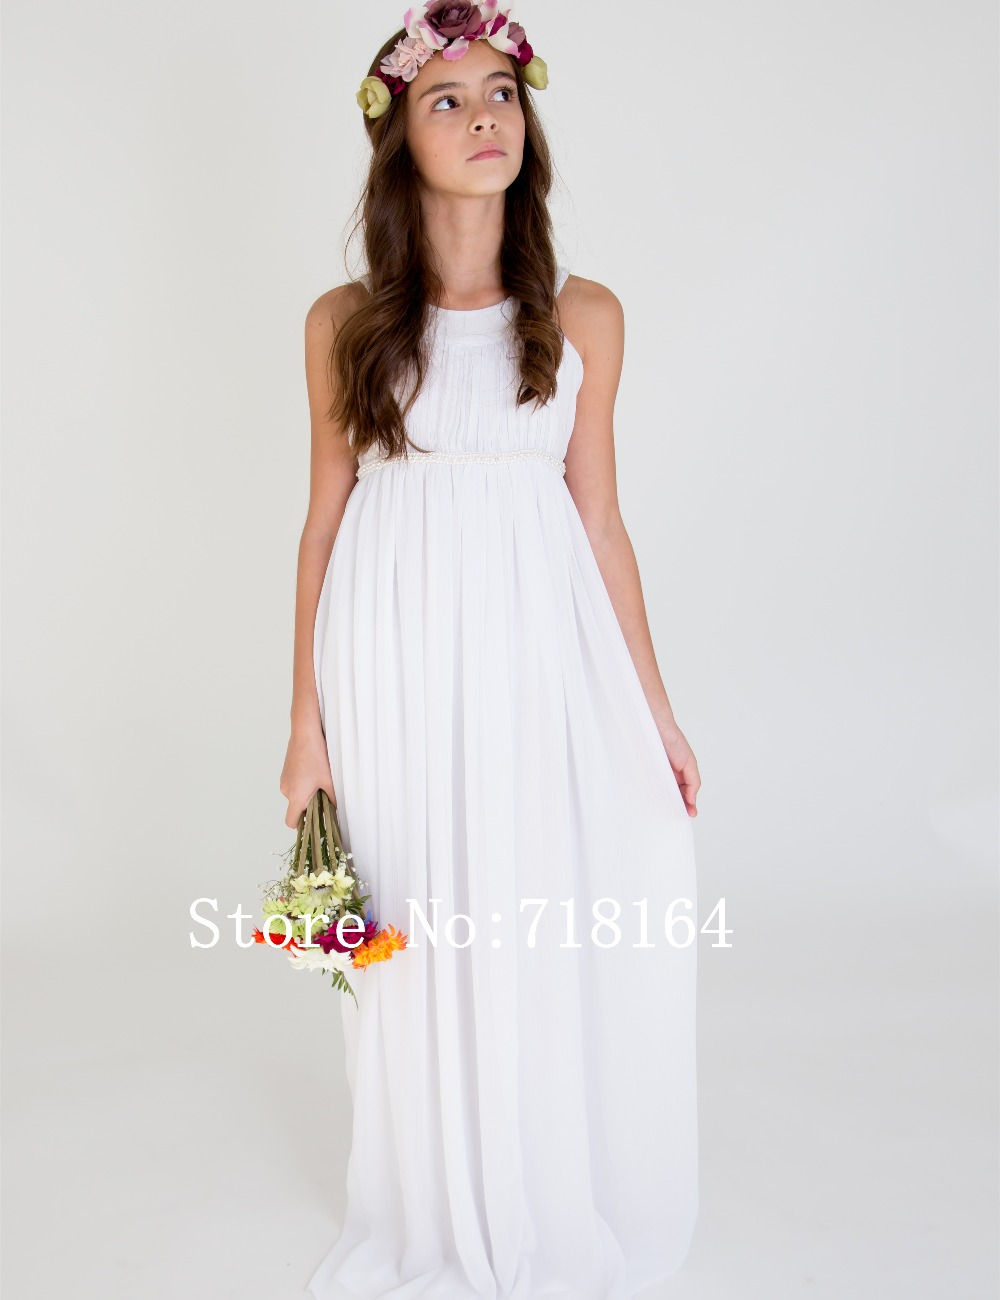 Vintage white ivory chiffon long flower girl dress first communion ...